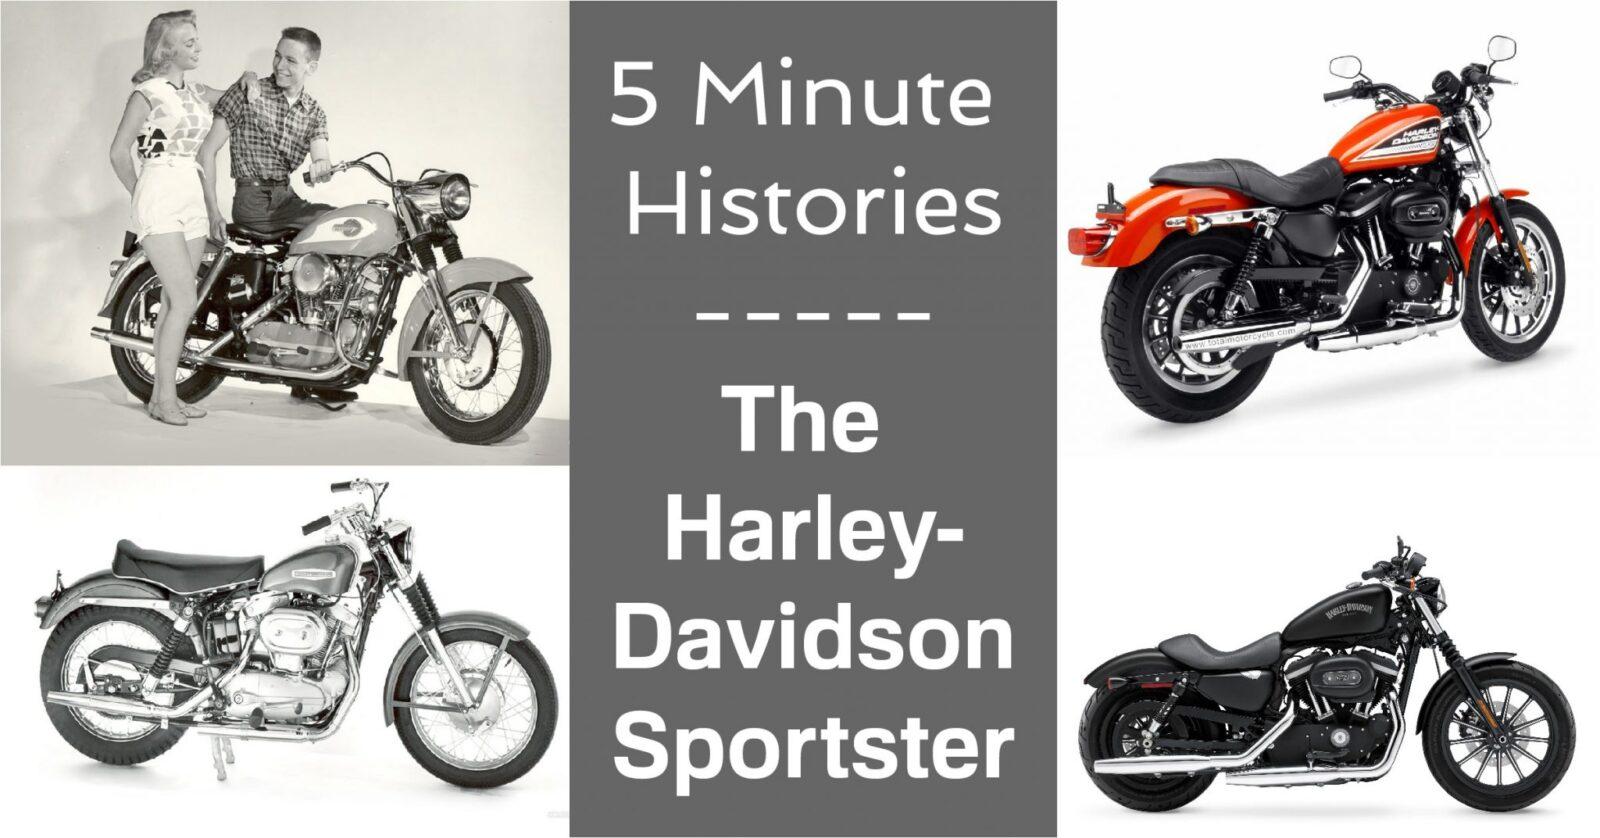 5 Minute Histories: Harley-Davidson Sportster